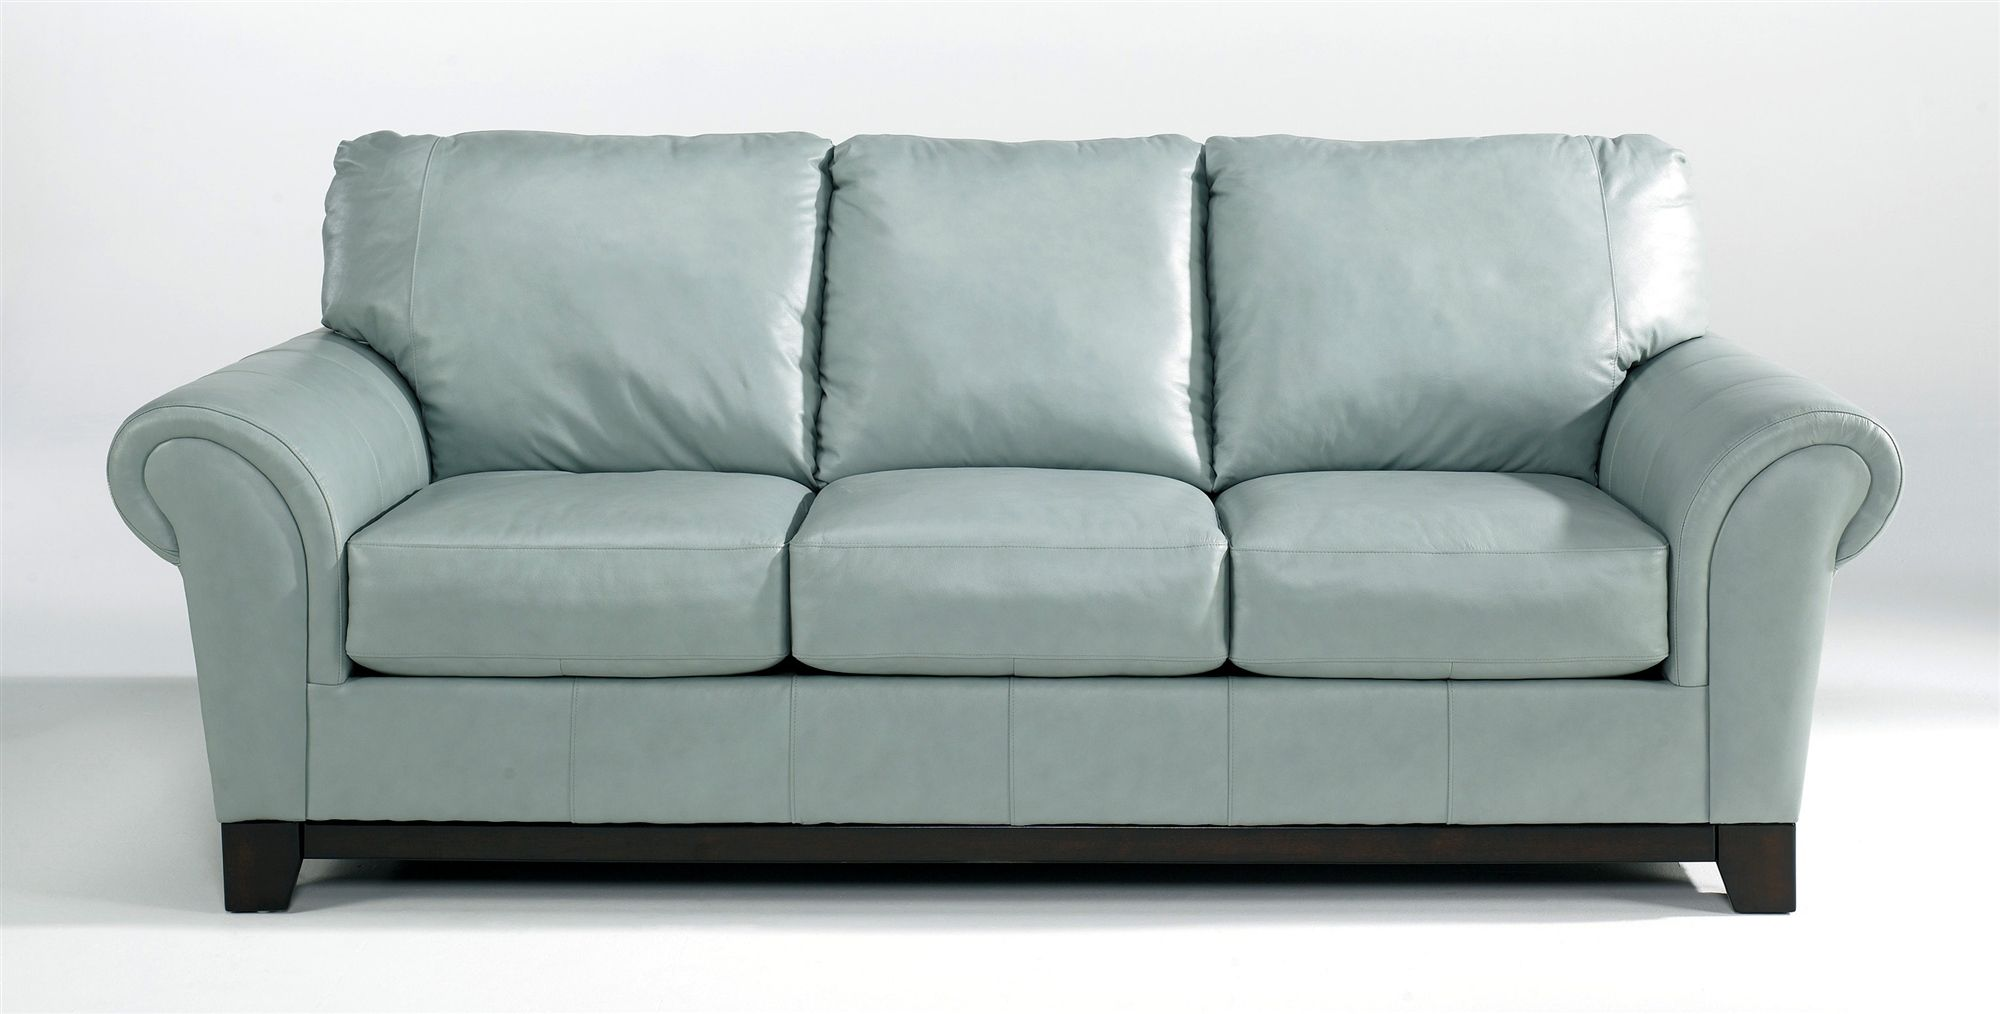 Powder Blue Leather Sofa   Blue leather sofa, Best leather ...